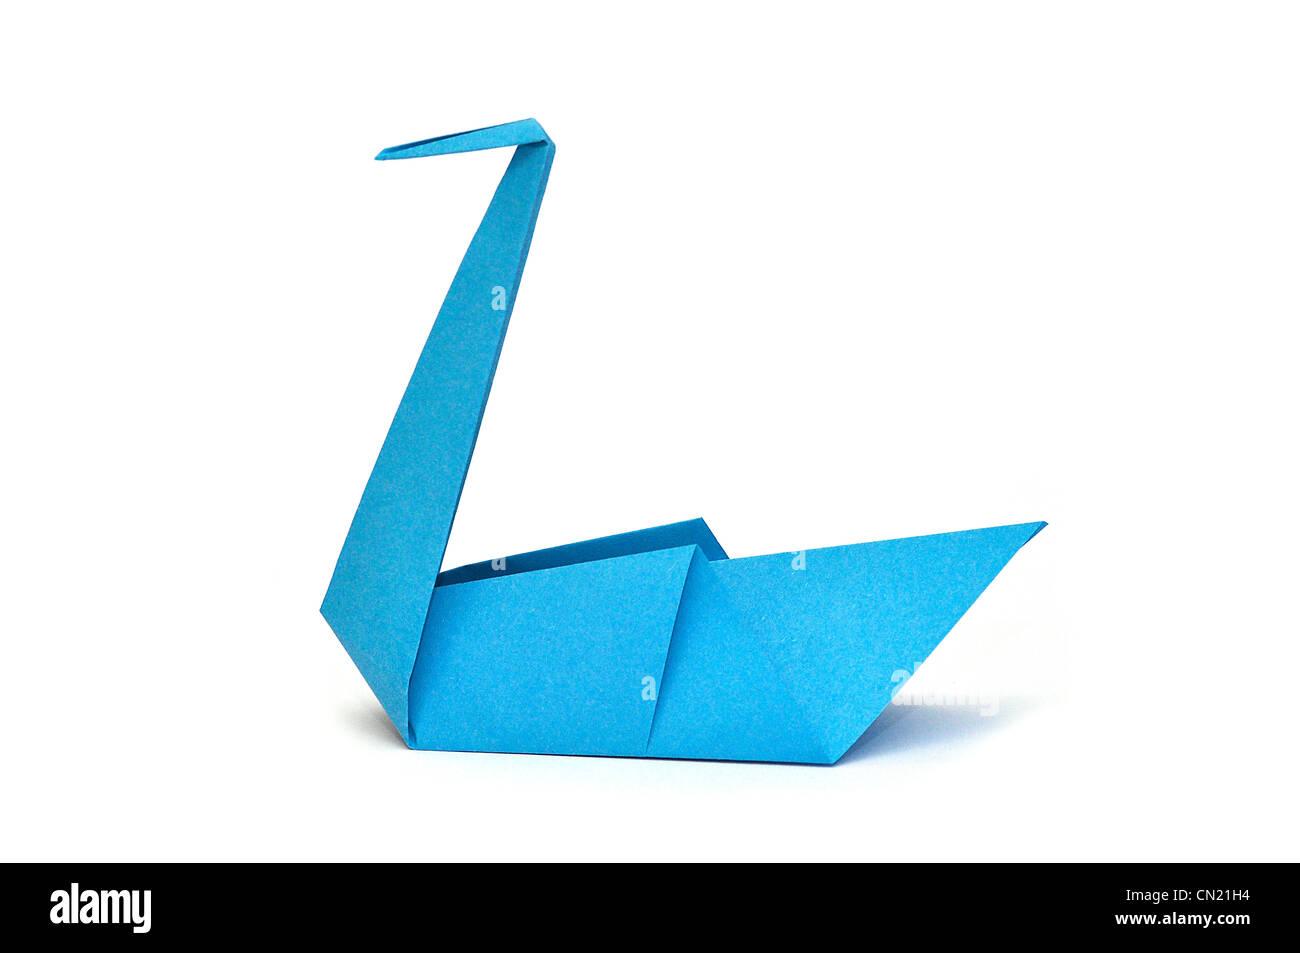 Blaues Papier Origami Schwan Stockbild